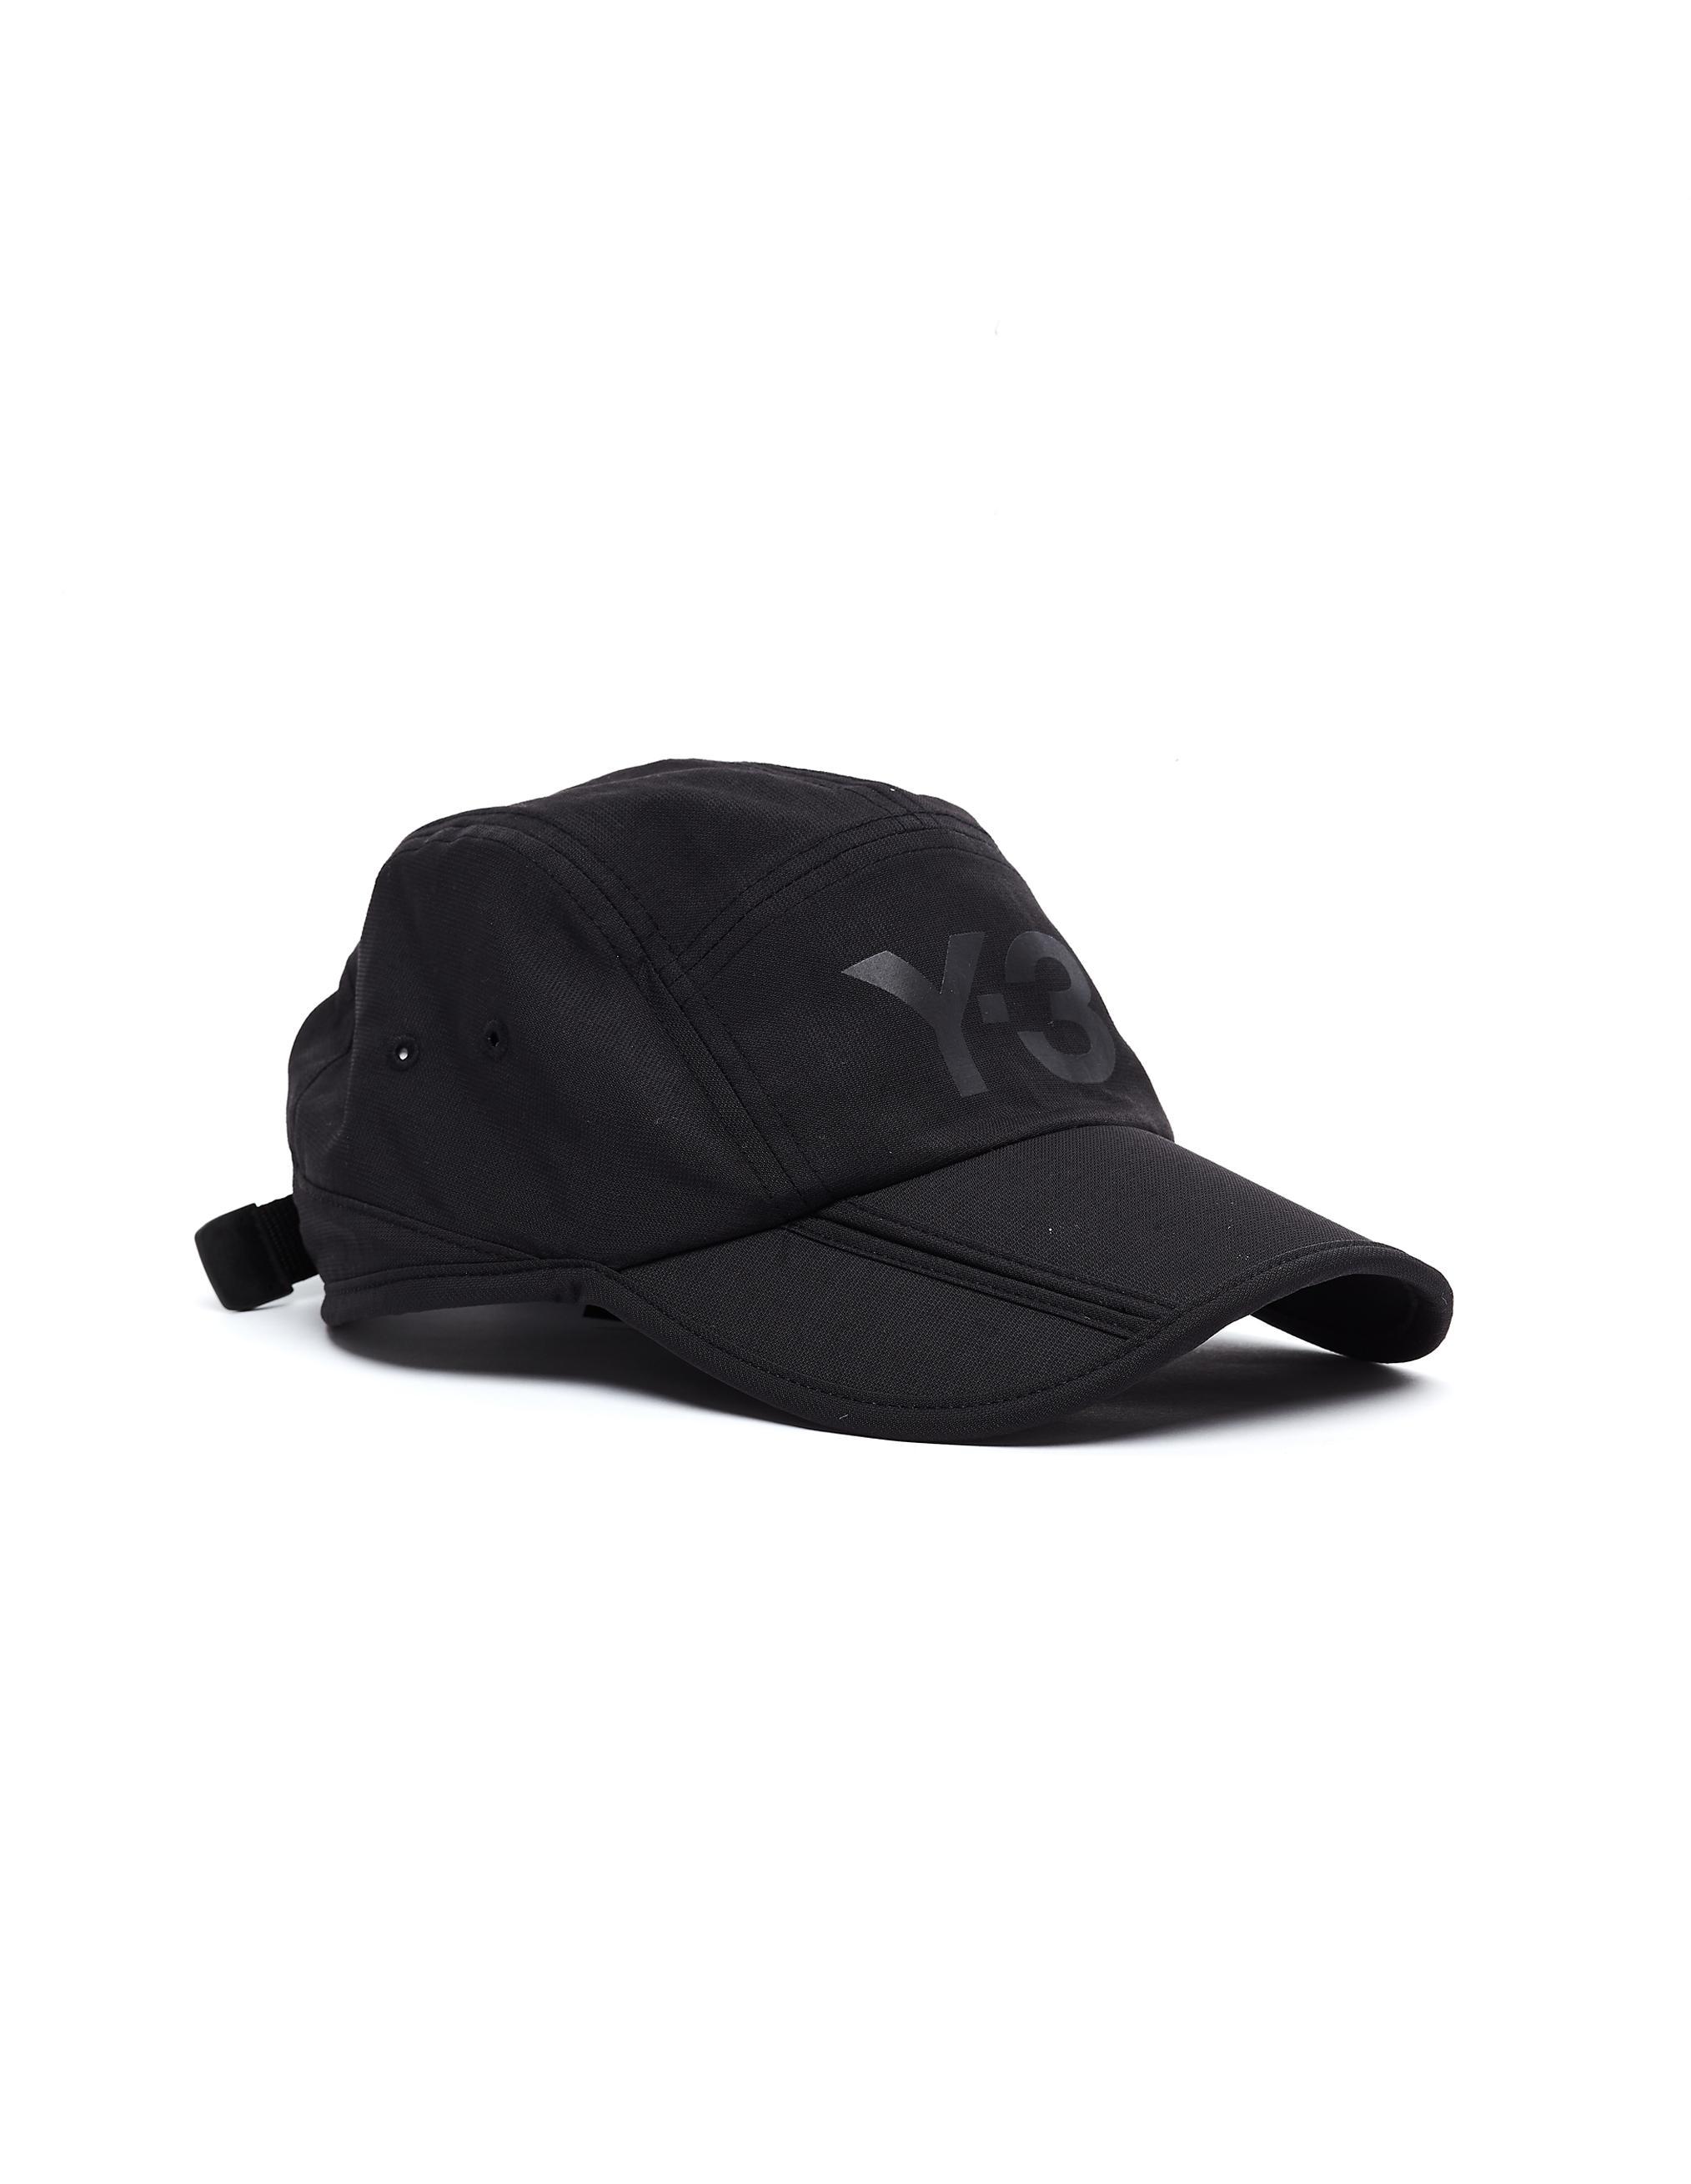 899bda023 Y-3 Black Foldable Cap in Black for Men - Lyst